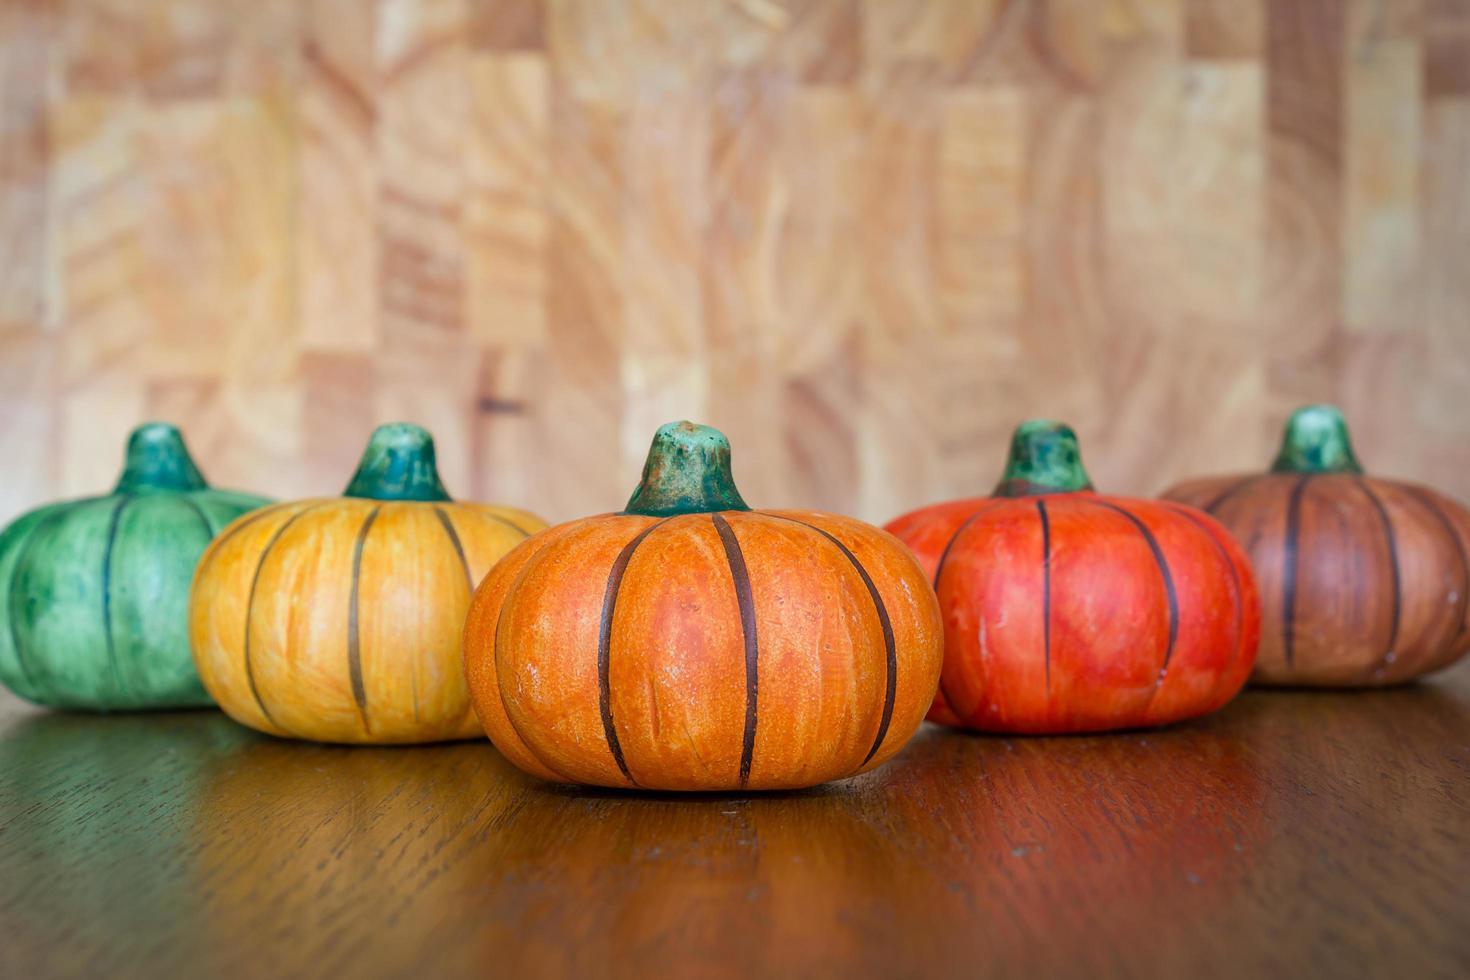 Five ceramic pumpkins photo